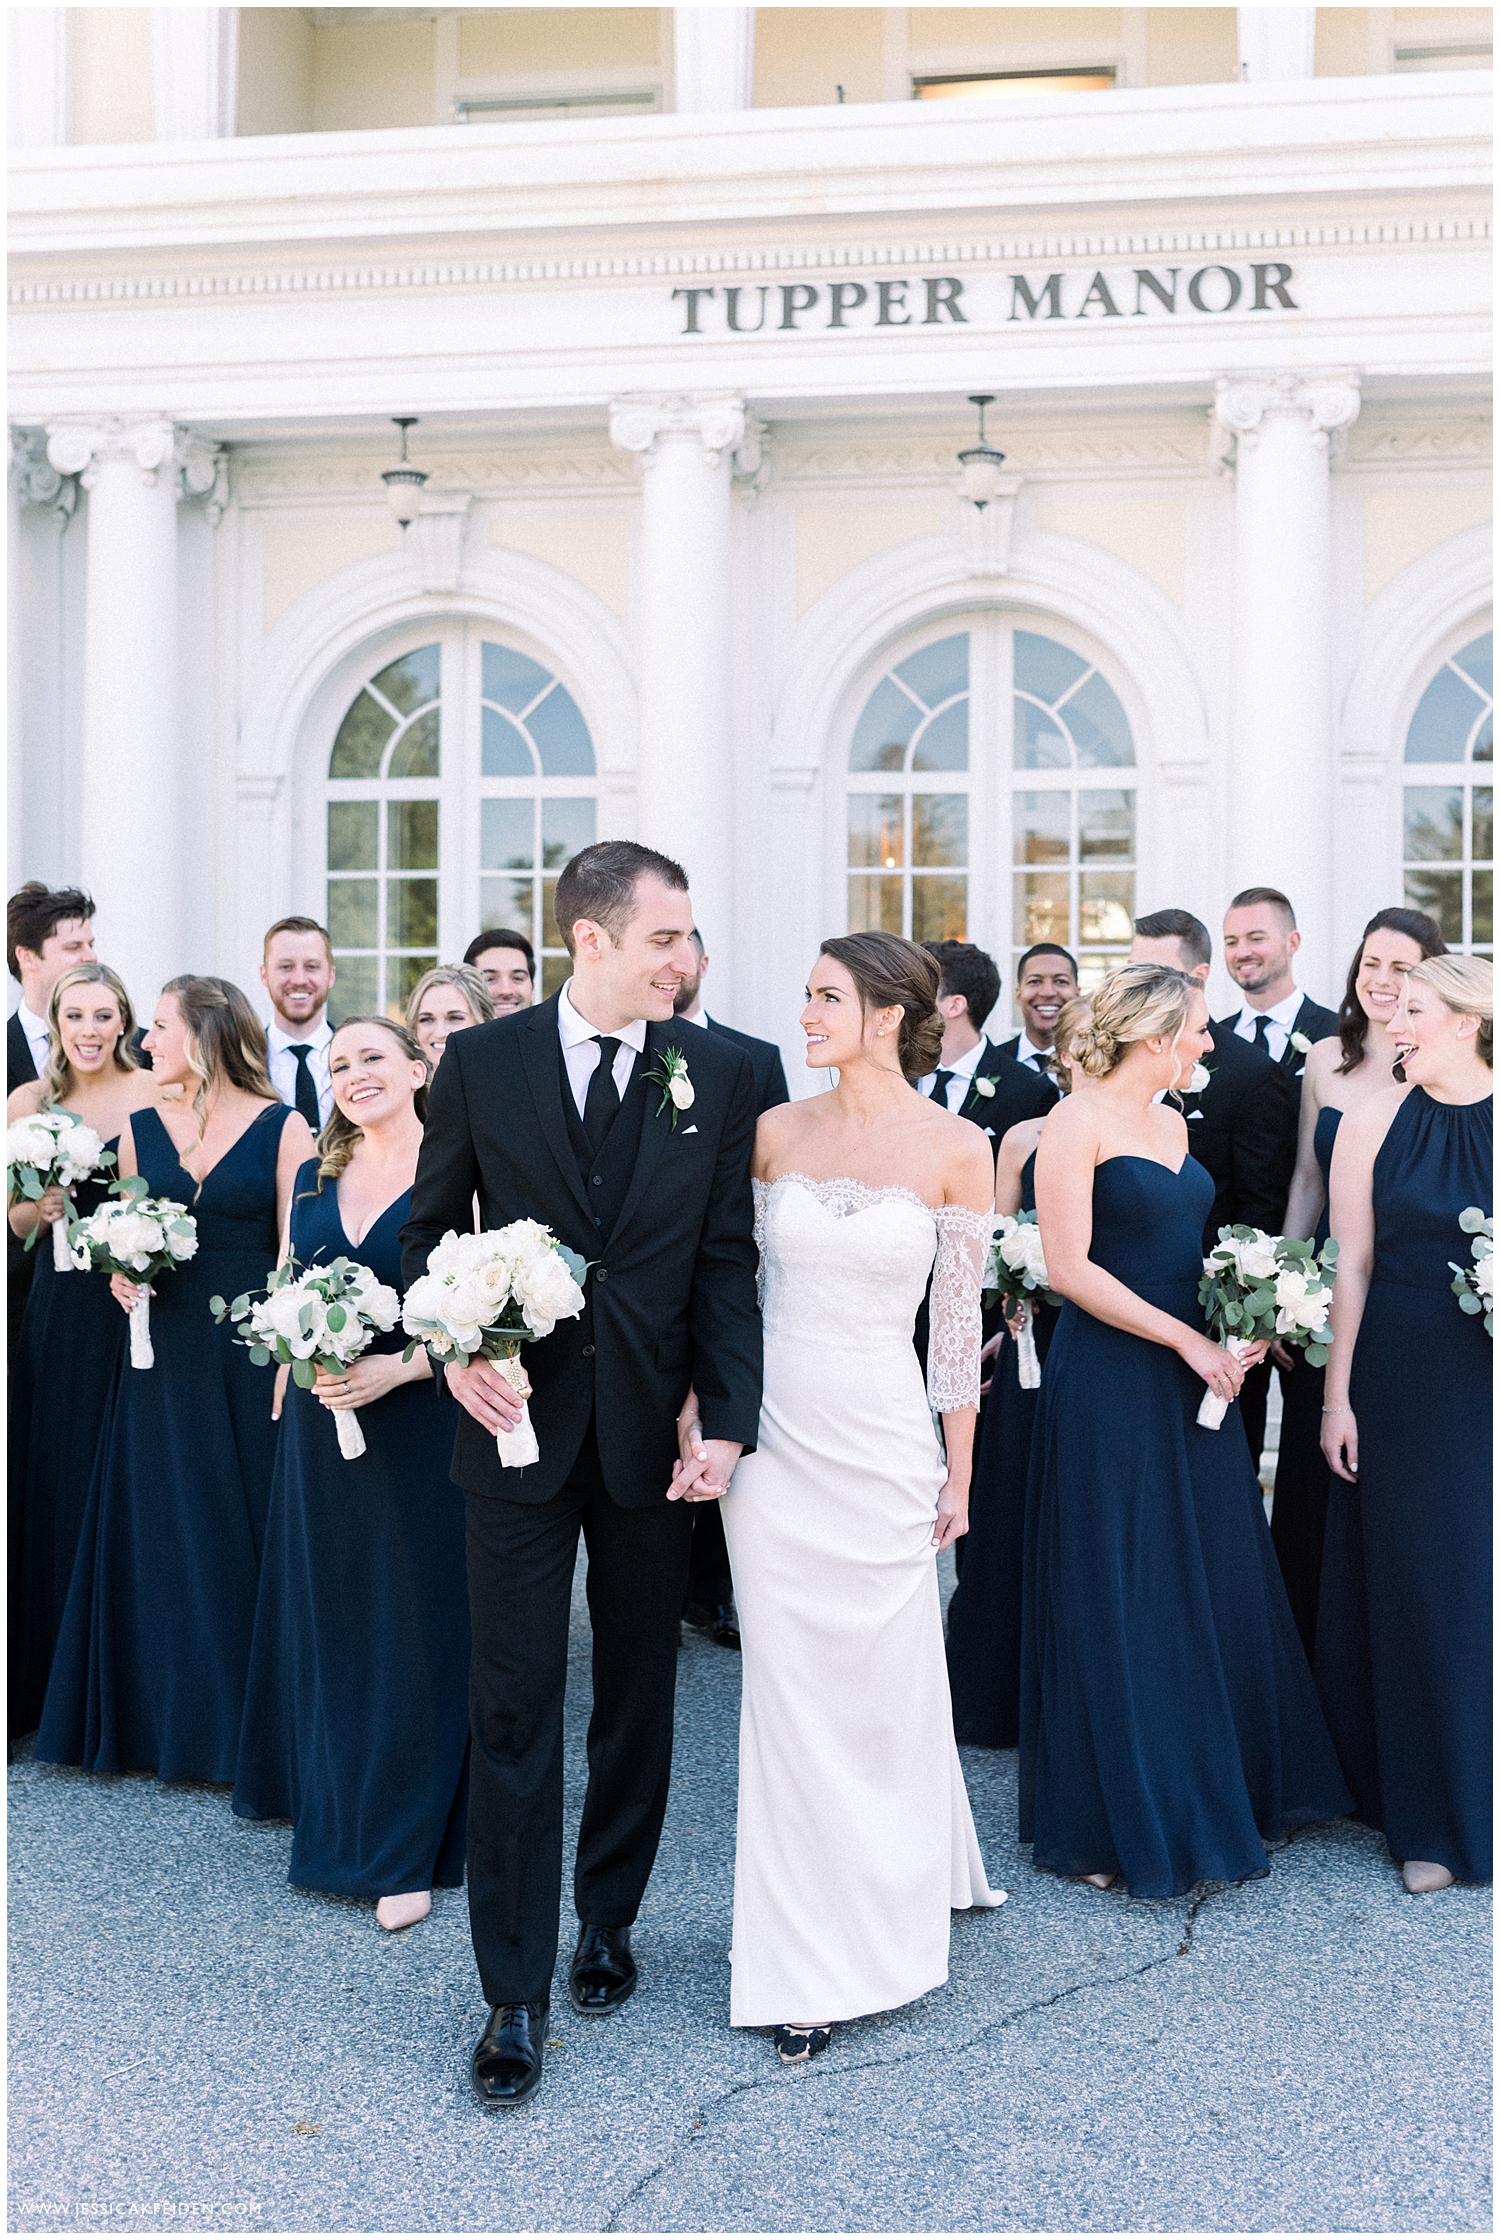 Jessica K Feiden Photography_Tupper Manor Beverly Wedding Photographer_0035.jpg